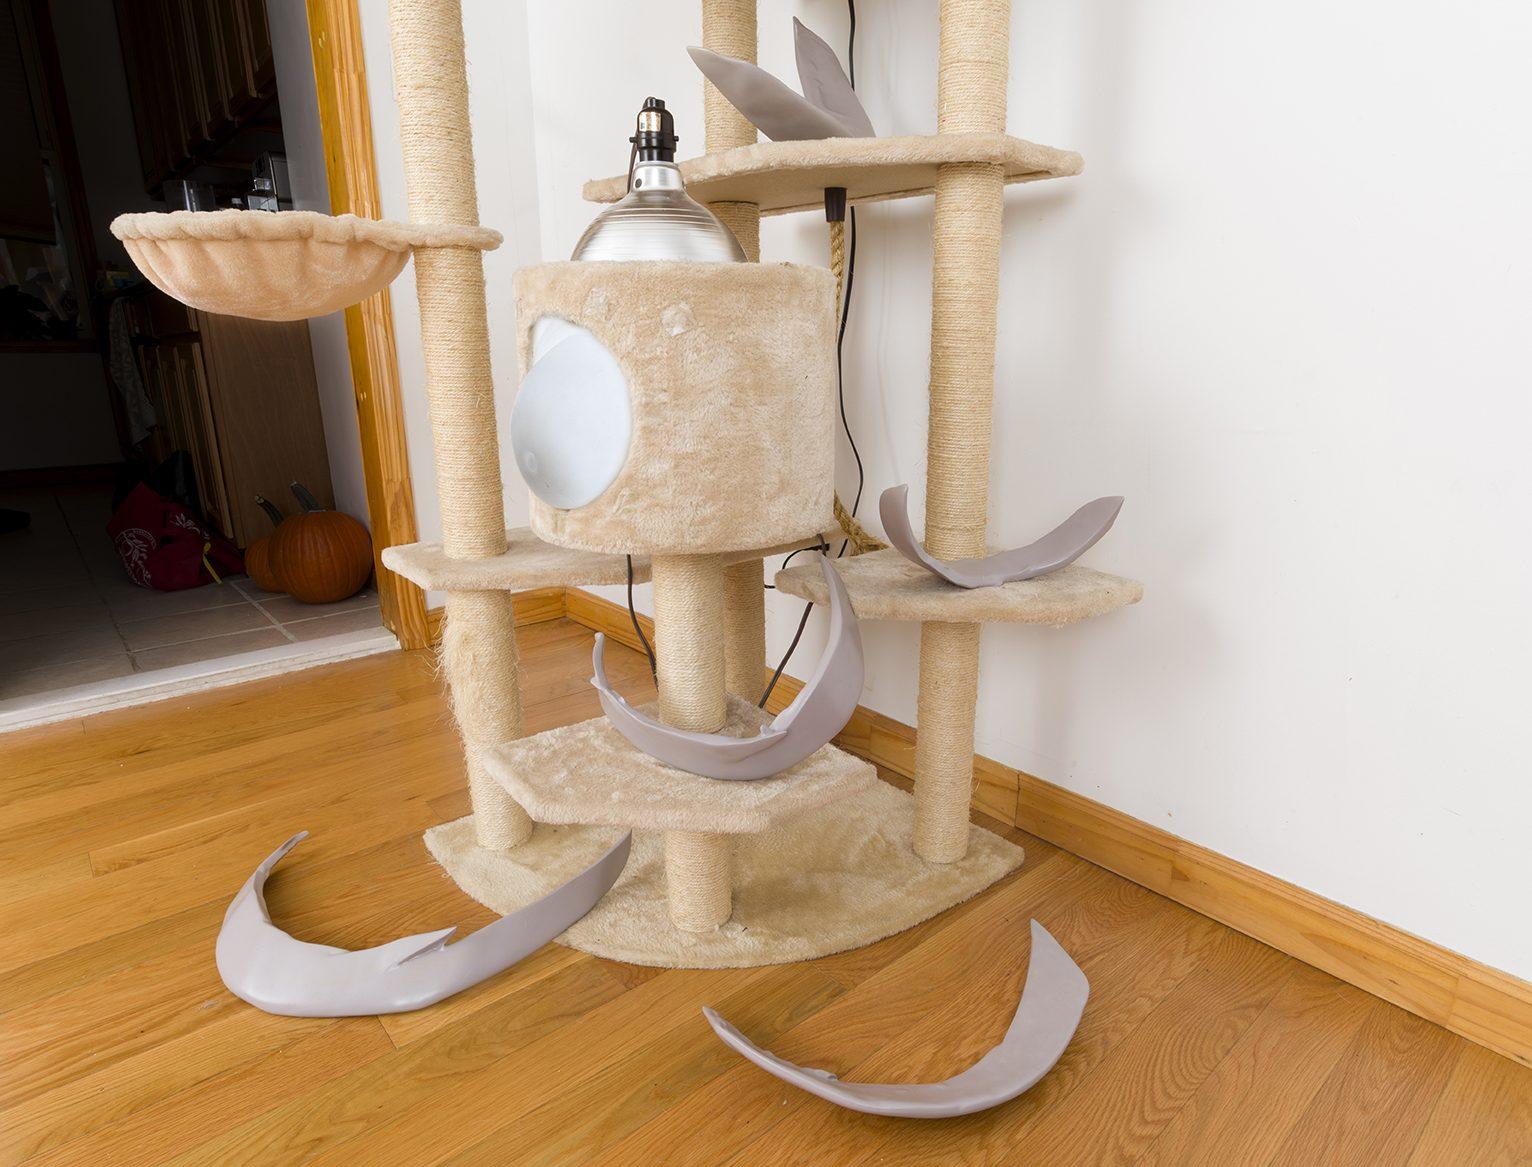 Nicolas Pelzer - Catbox Contemporary